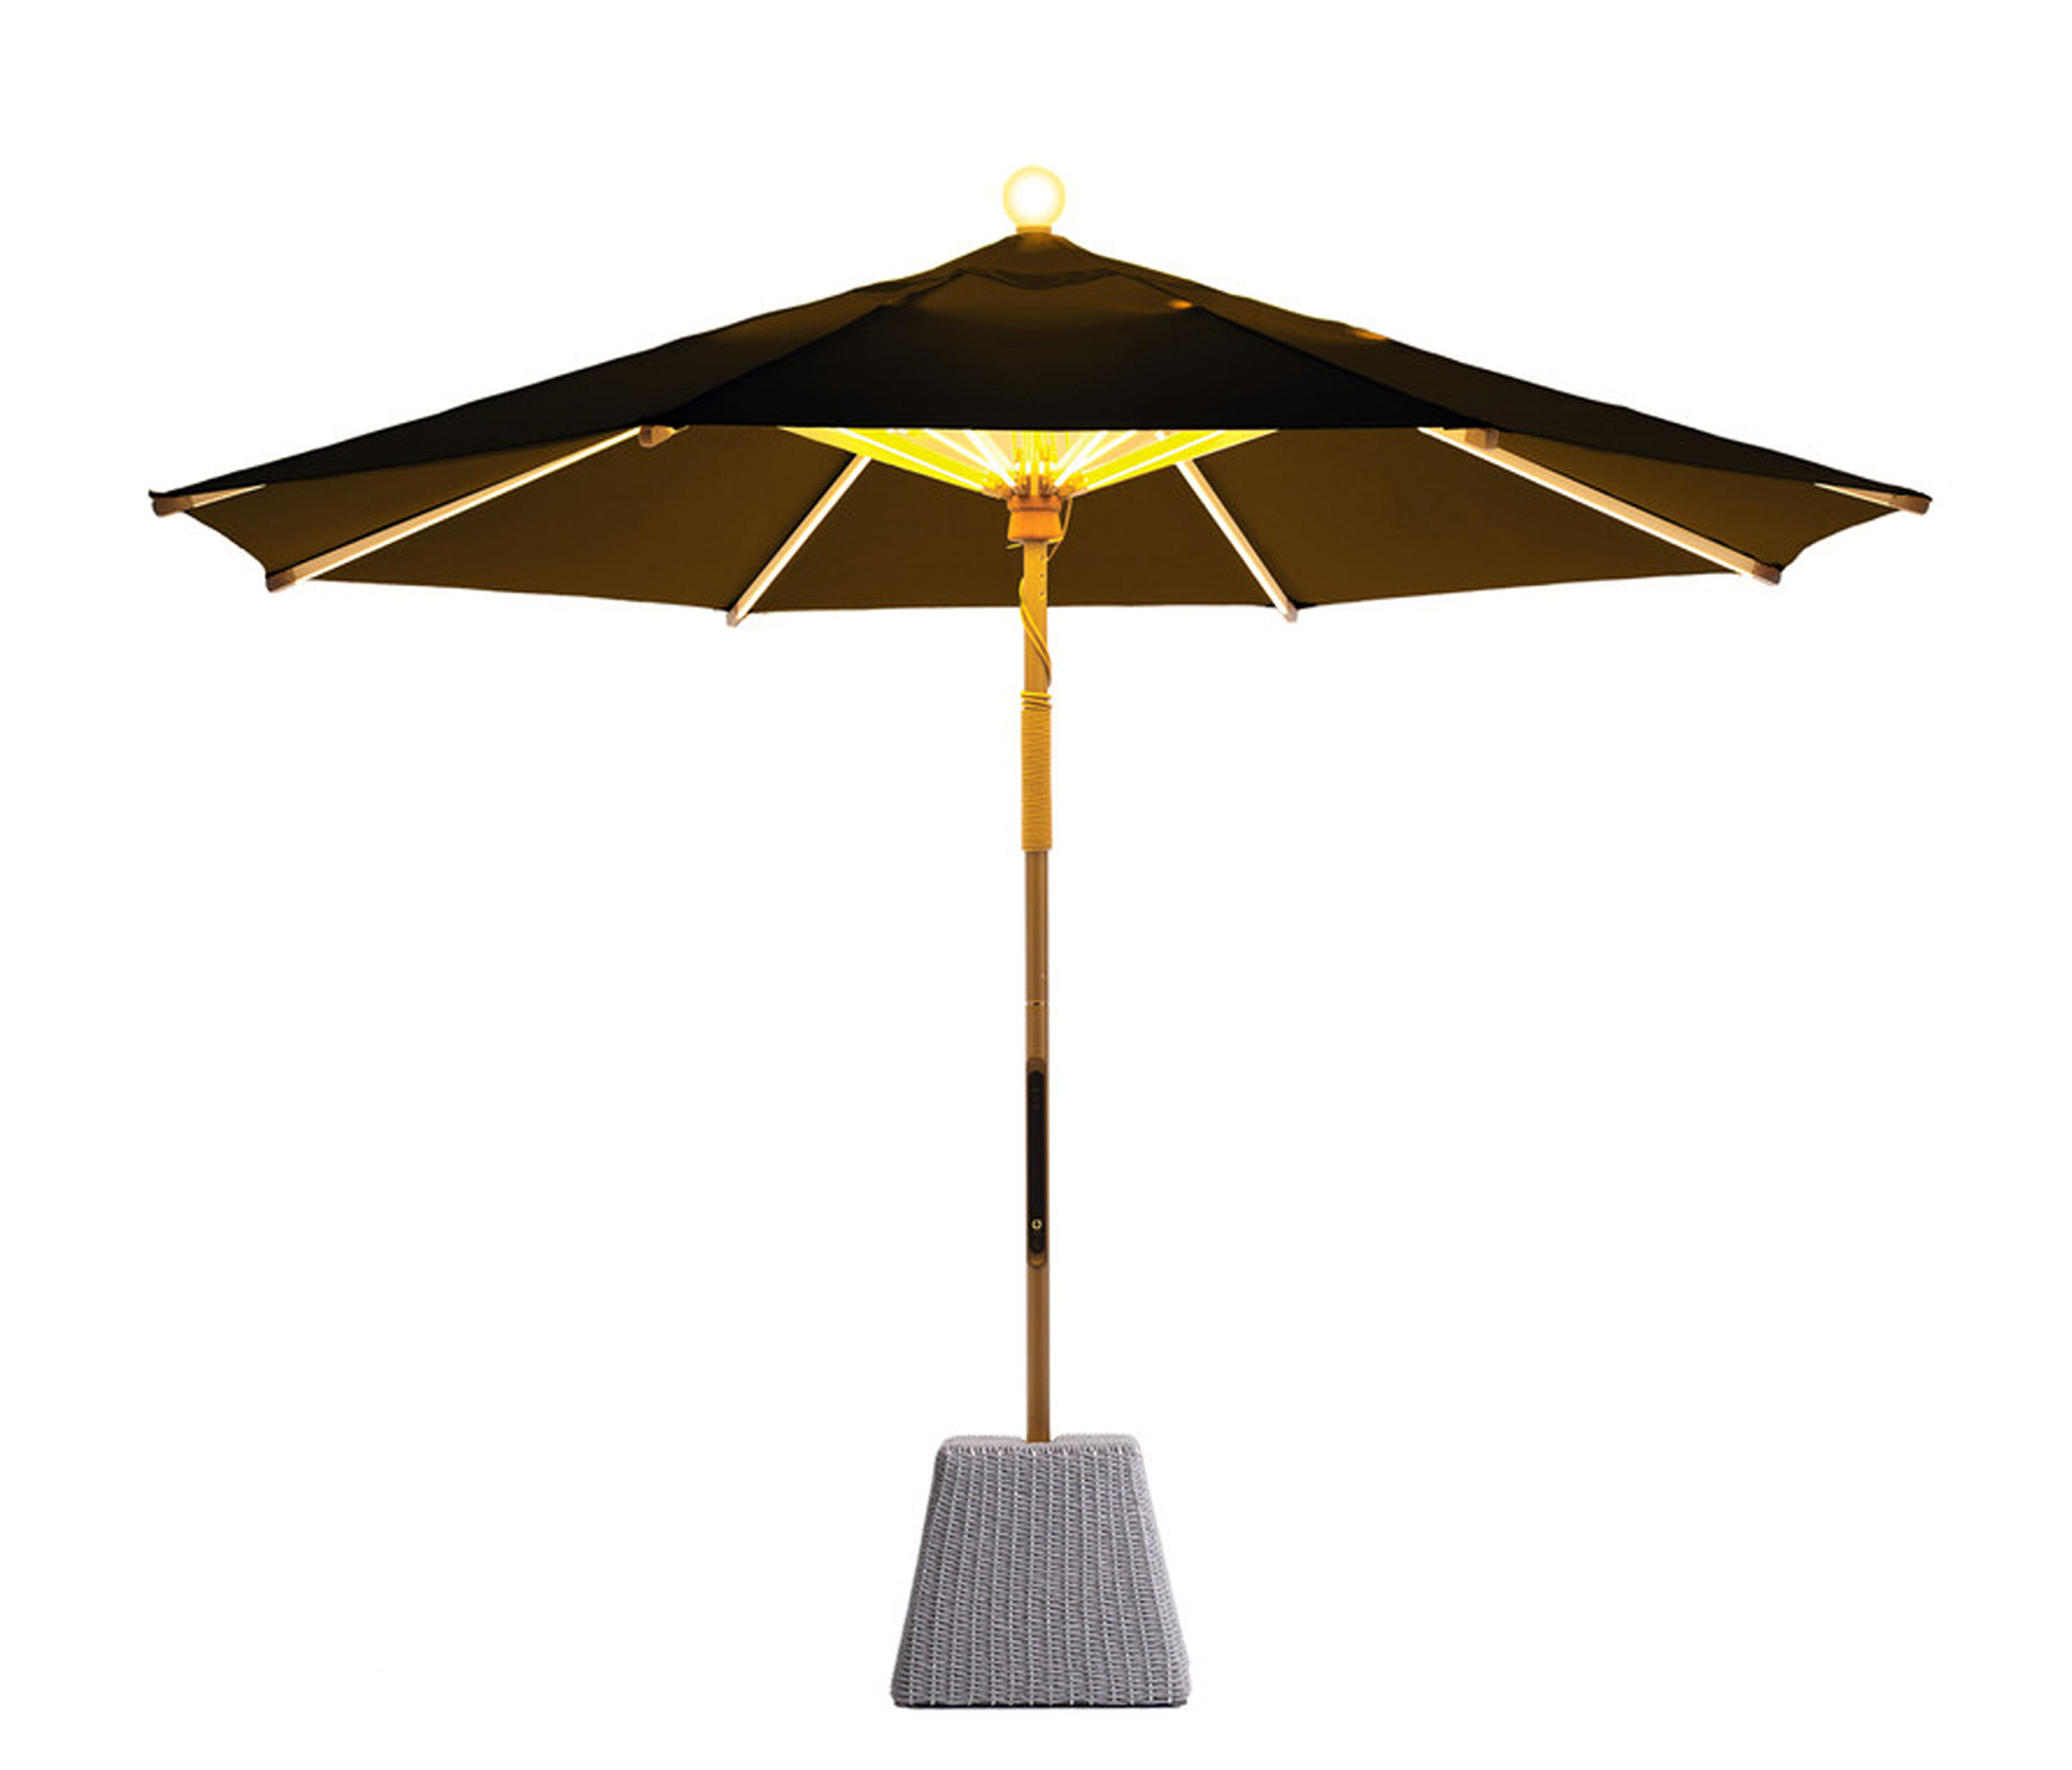 ni parasol 300 sunbrella parasols from foxcat design. Black Bedroom Furniture Sets. Home Design Ideas